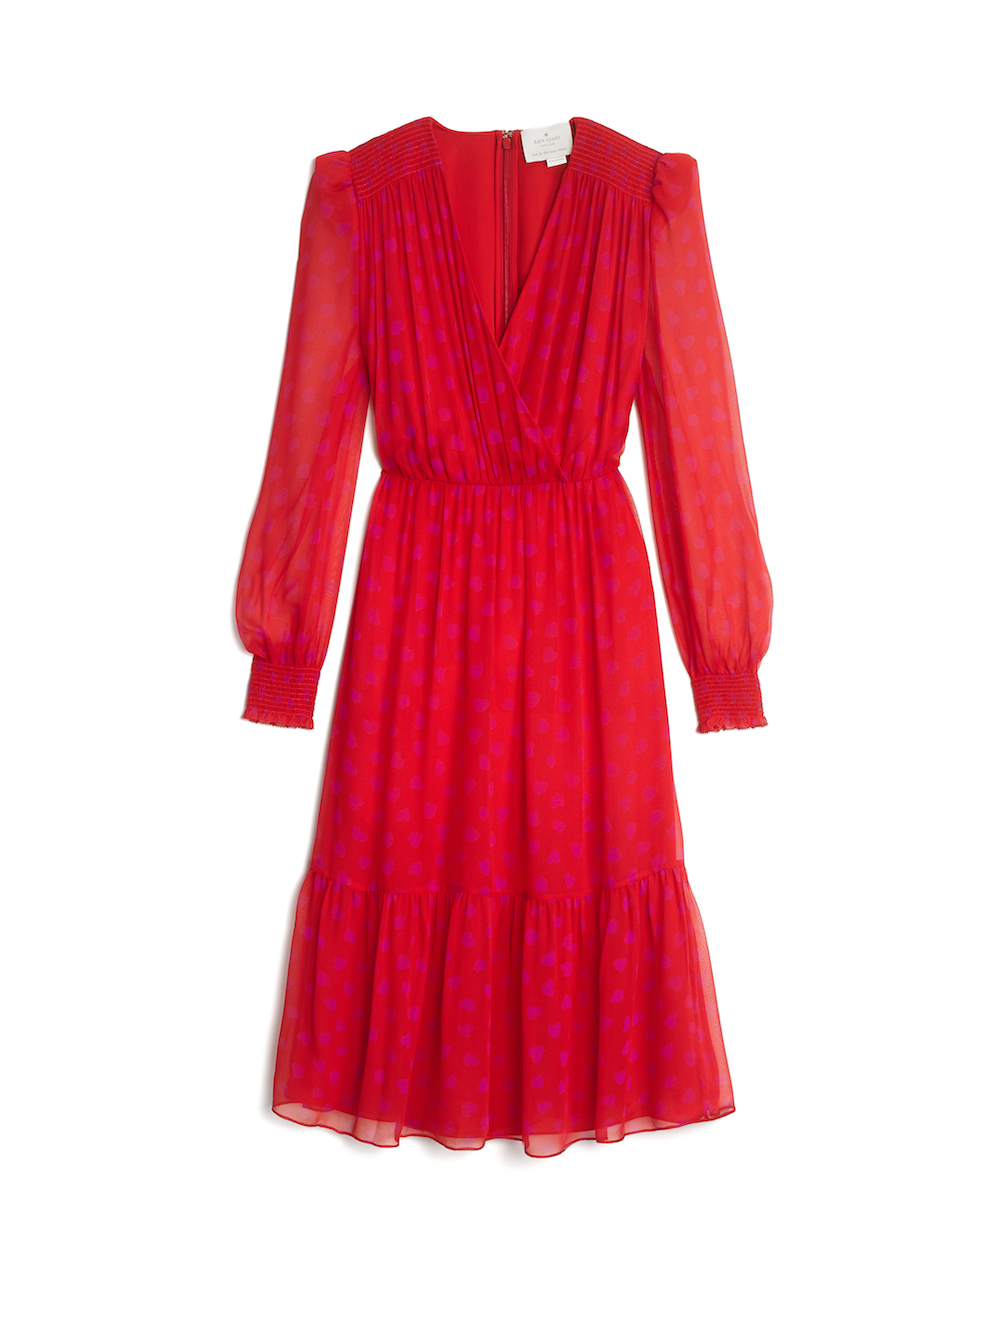 Kate Spade New York Heartbeat Silk Midi Dress ($800)